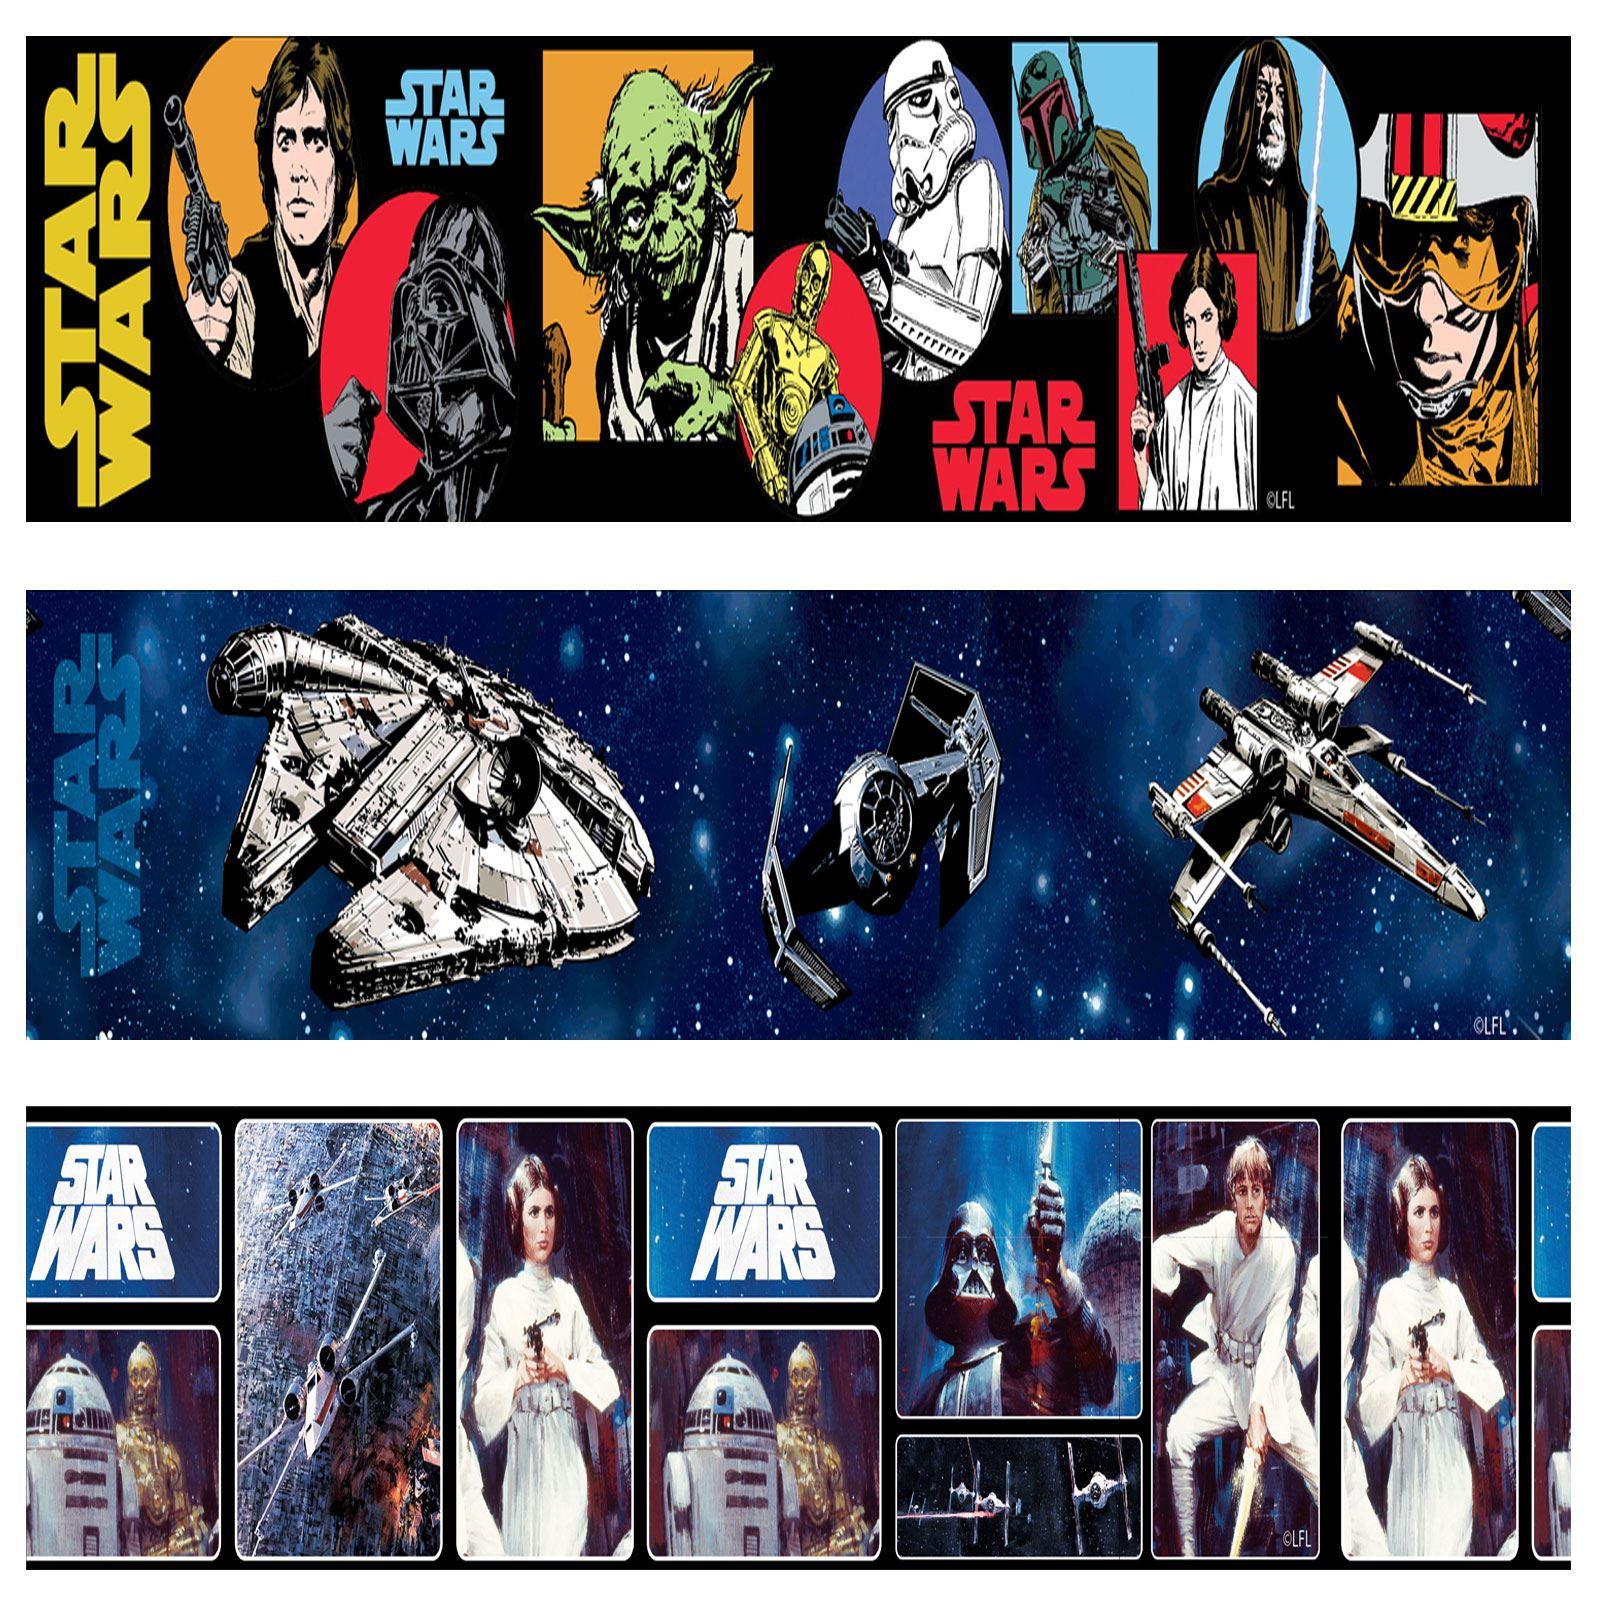 star wars wallpaper border   galleryimage.co